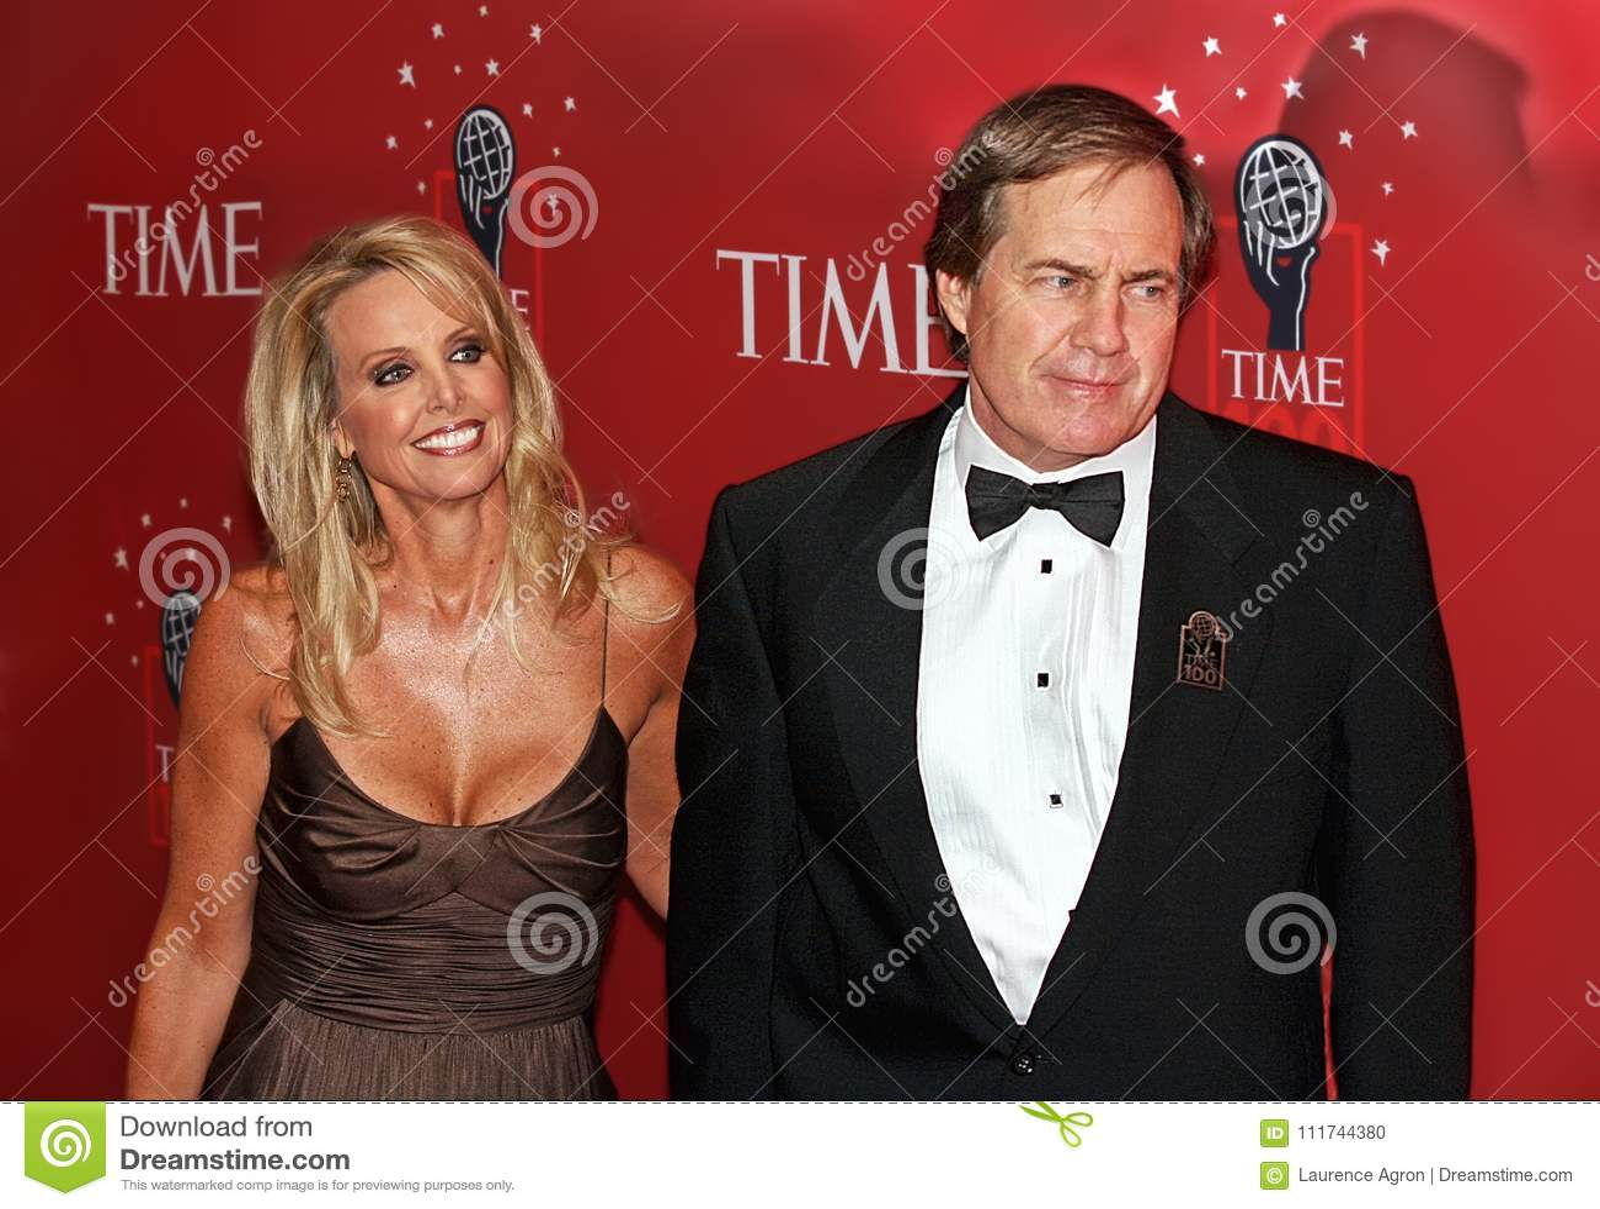 Bill Belichicks decade-long girlfriend is Linda Holliday